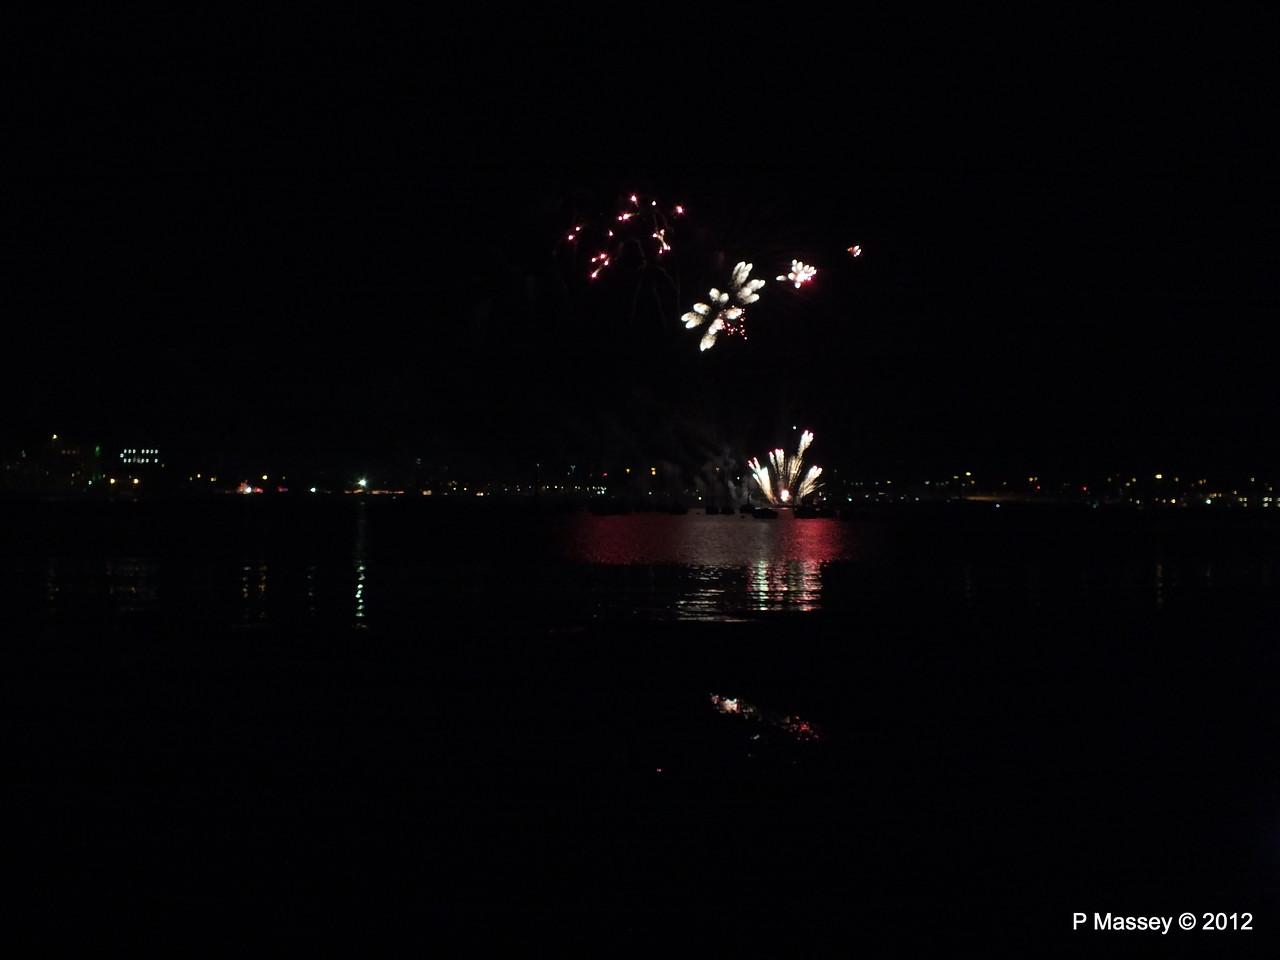 Fireworks off Mayflower Park PDM 03-11-2012 20-44-19